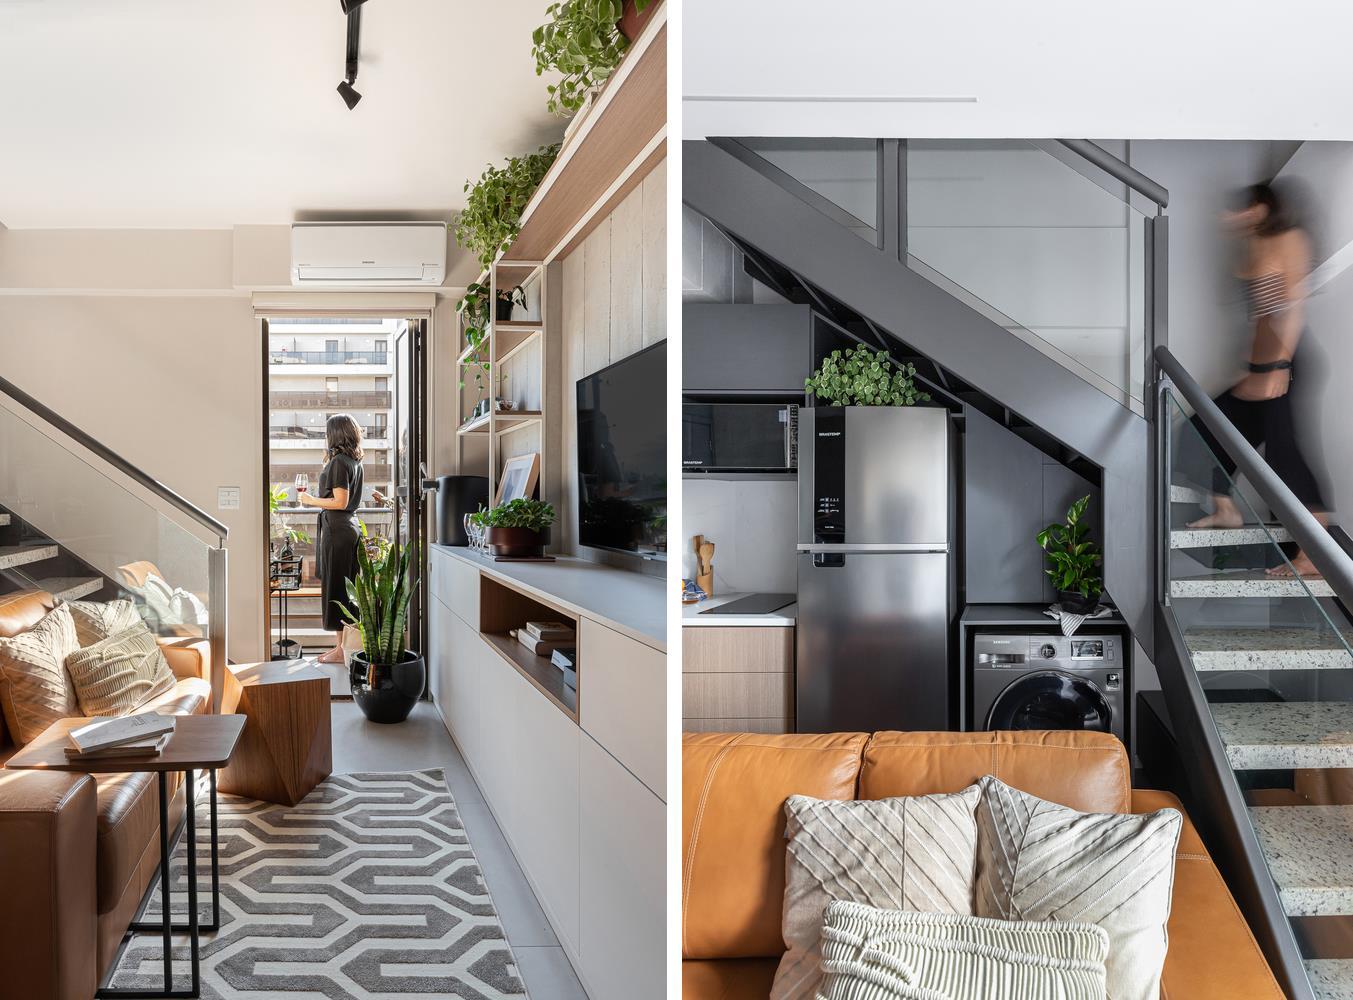 Duplex home interior design